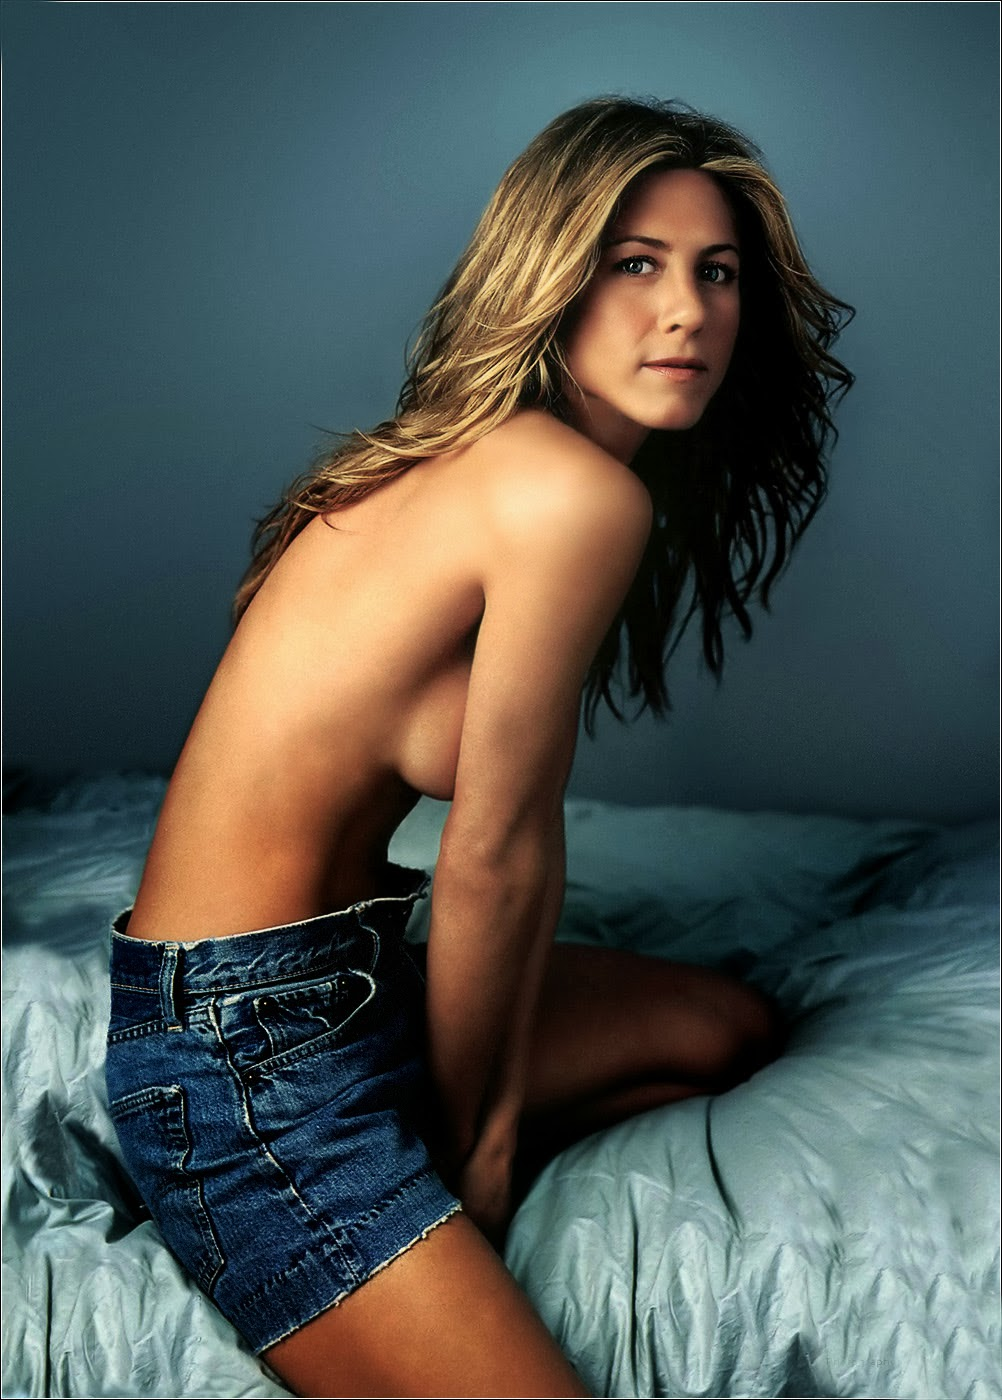 Actress Jennifer Aniston Hot HD Images | Hot Celebrity